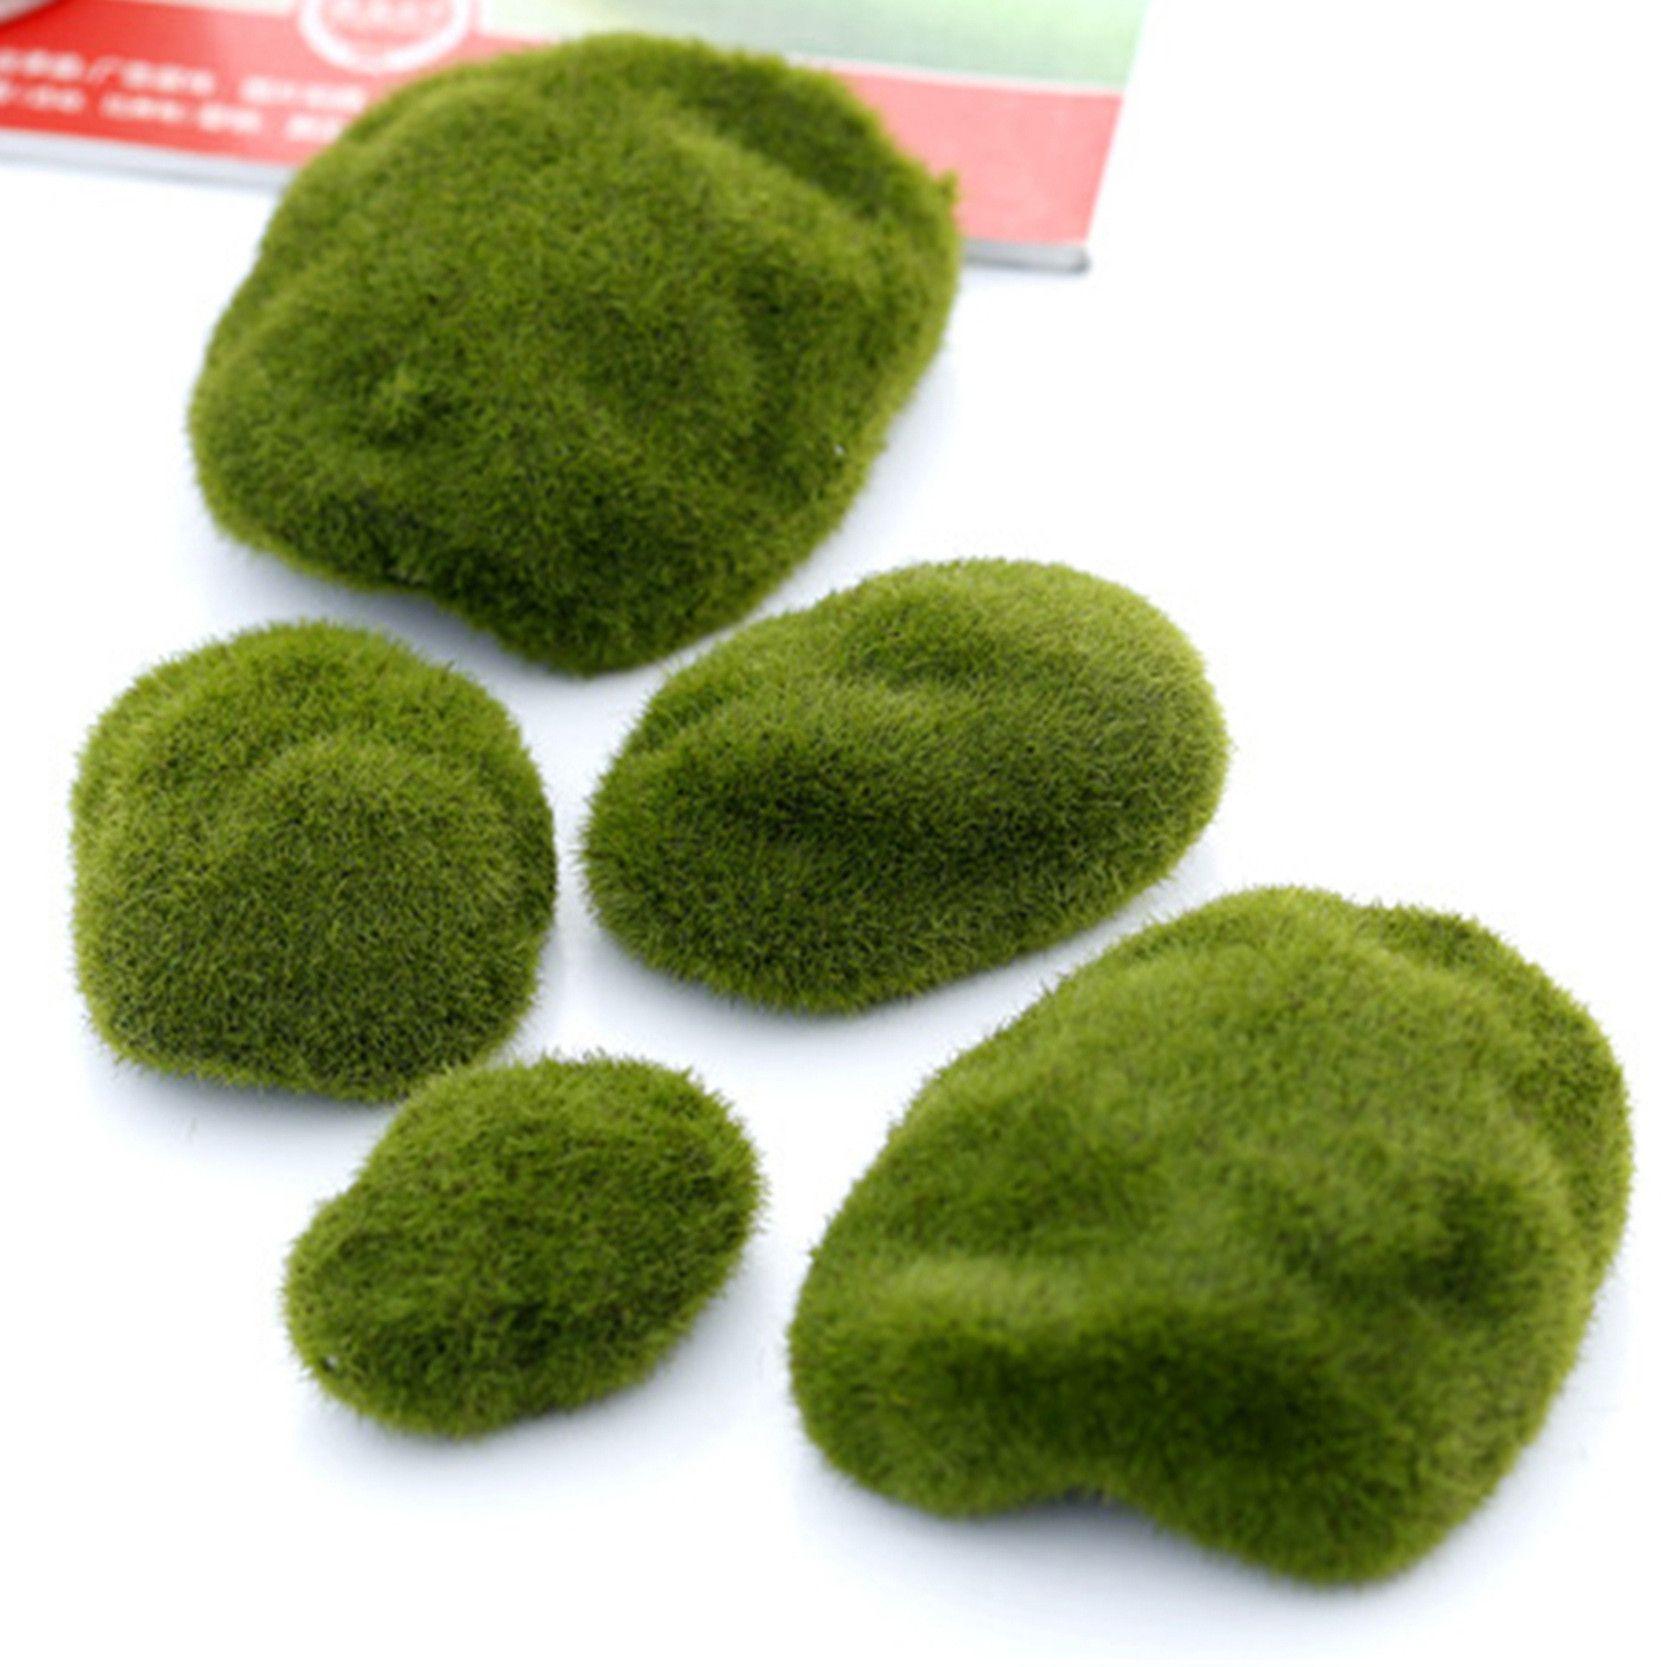 3 pcs Natural Green Artificial Moss Decorative Crafts Micro ...